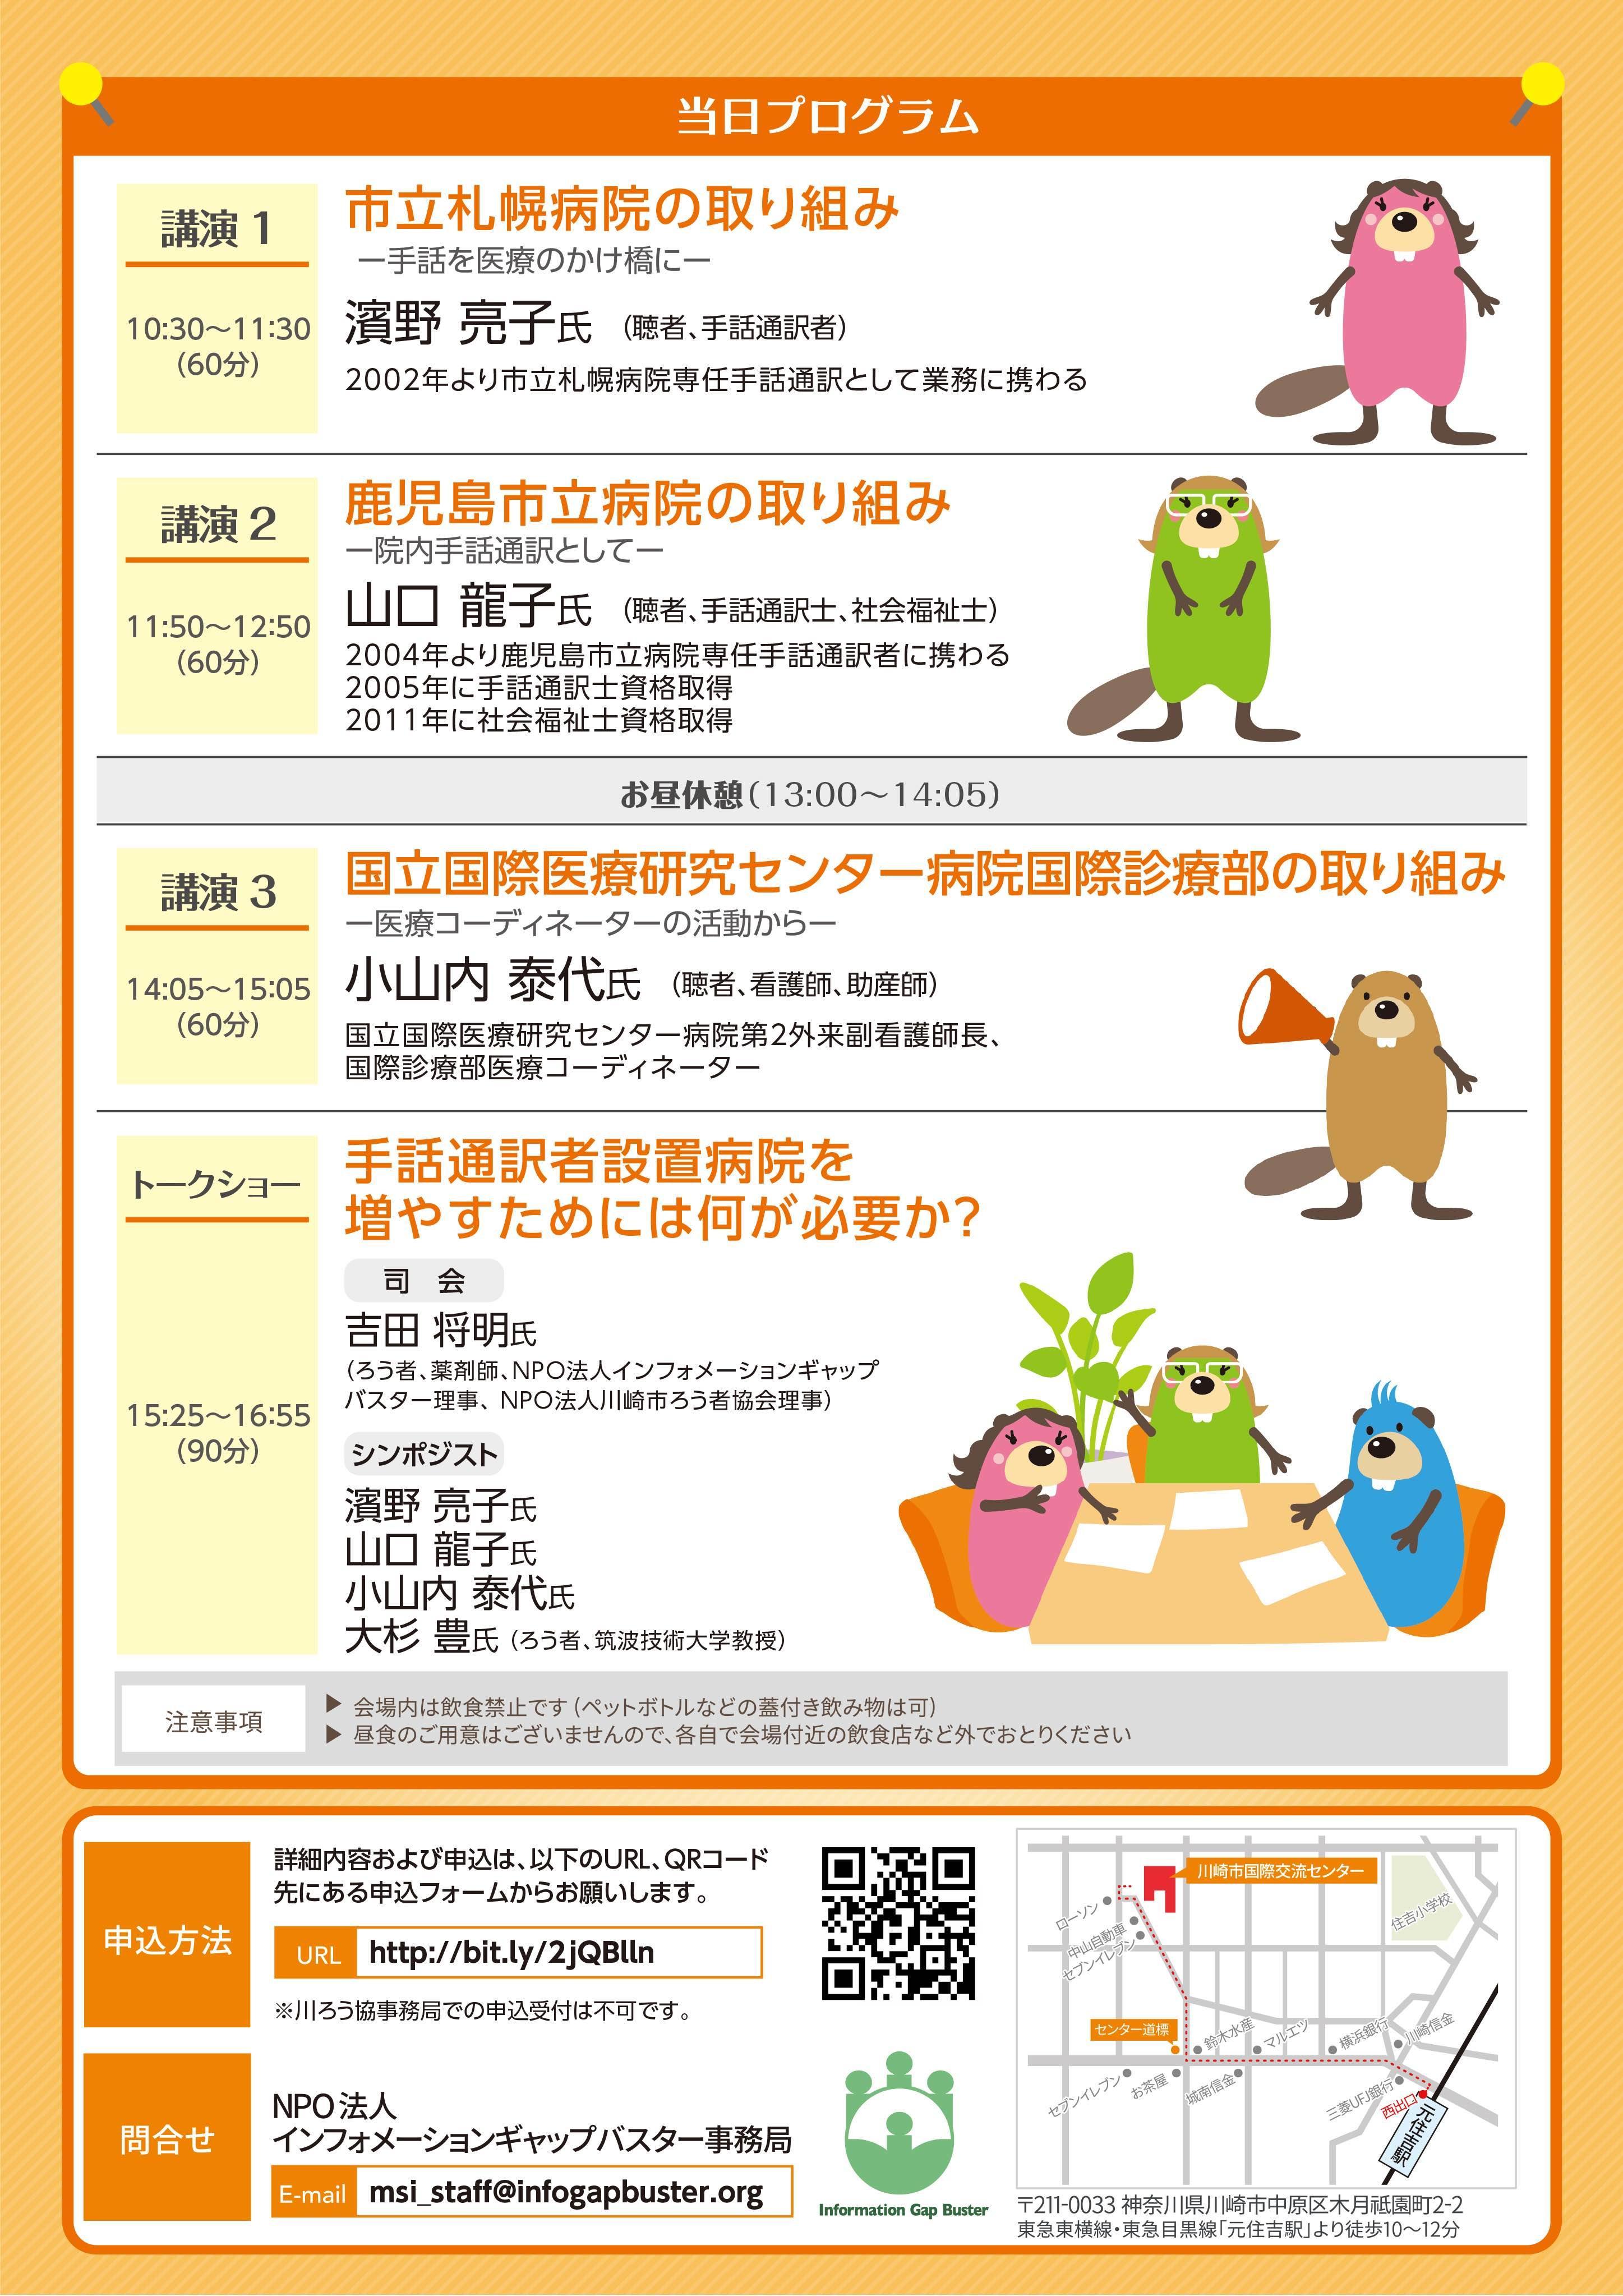 https://blogs.itmedia.co.jp/infogapbuster/916bfdc4433015afabbc27b261d48953a66a592e.jpg